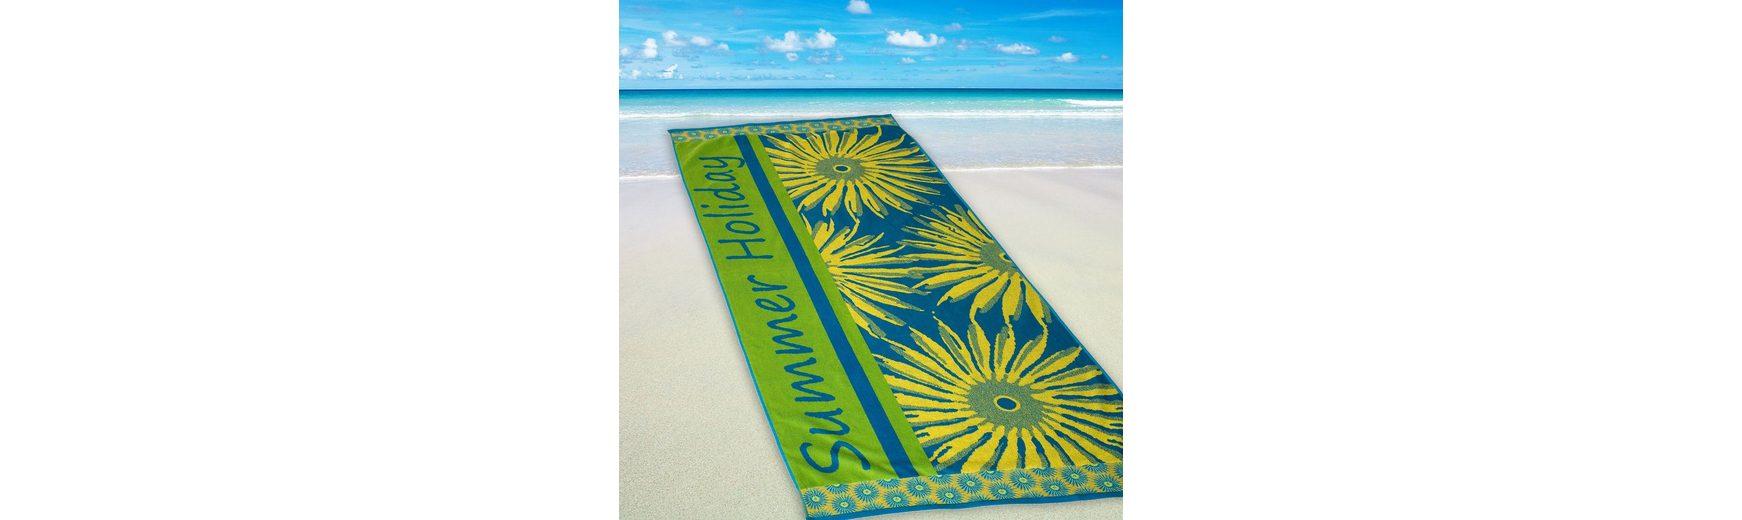 Strandtuch, Dyckhoff, »Summer Holiday«, mit Sonnenmotiven